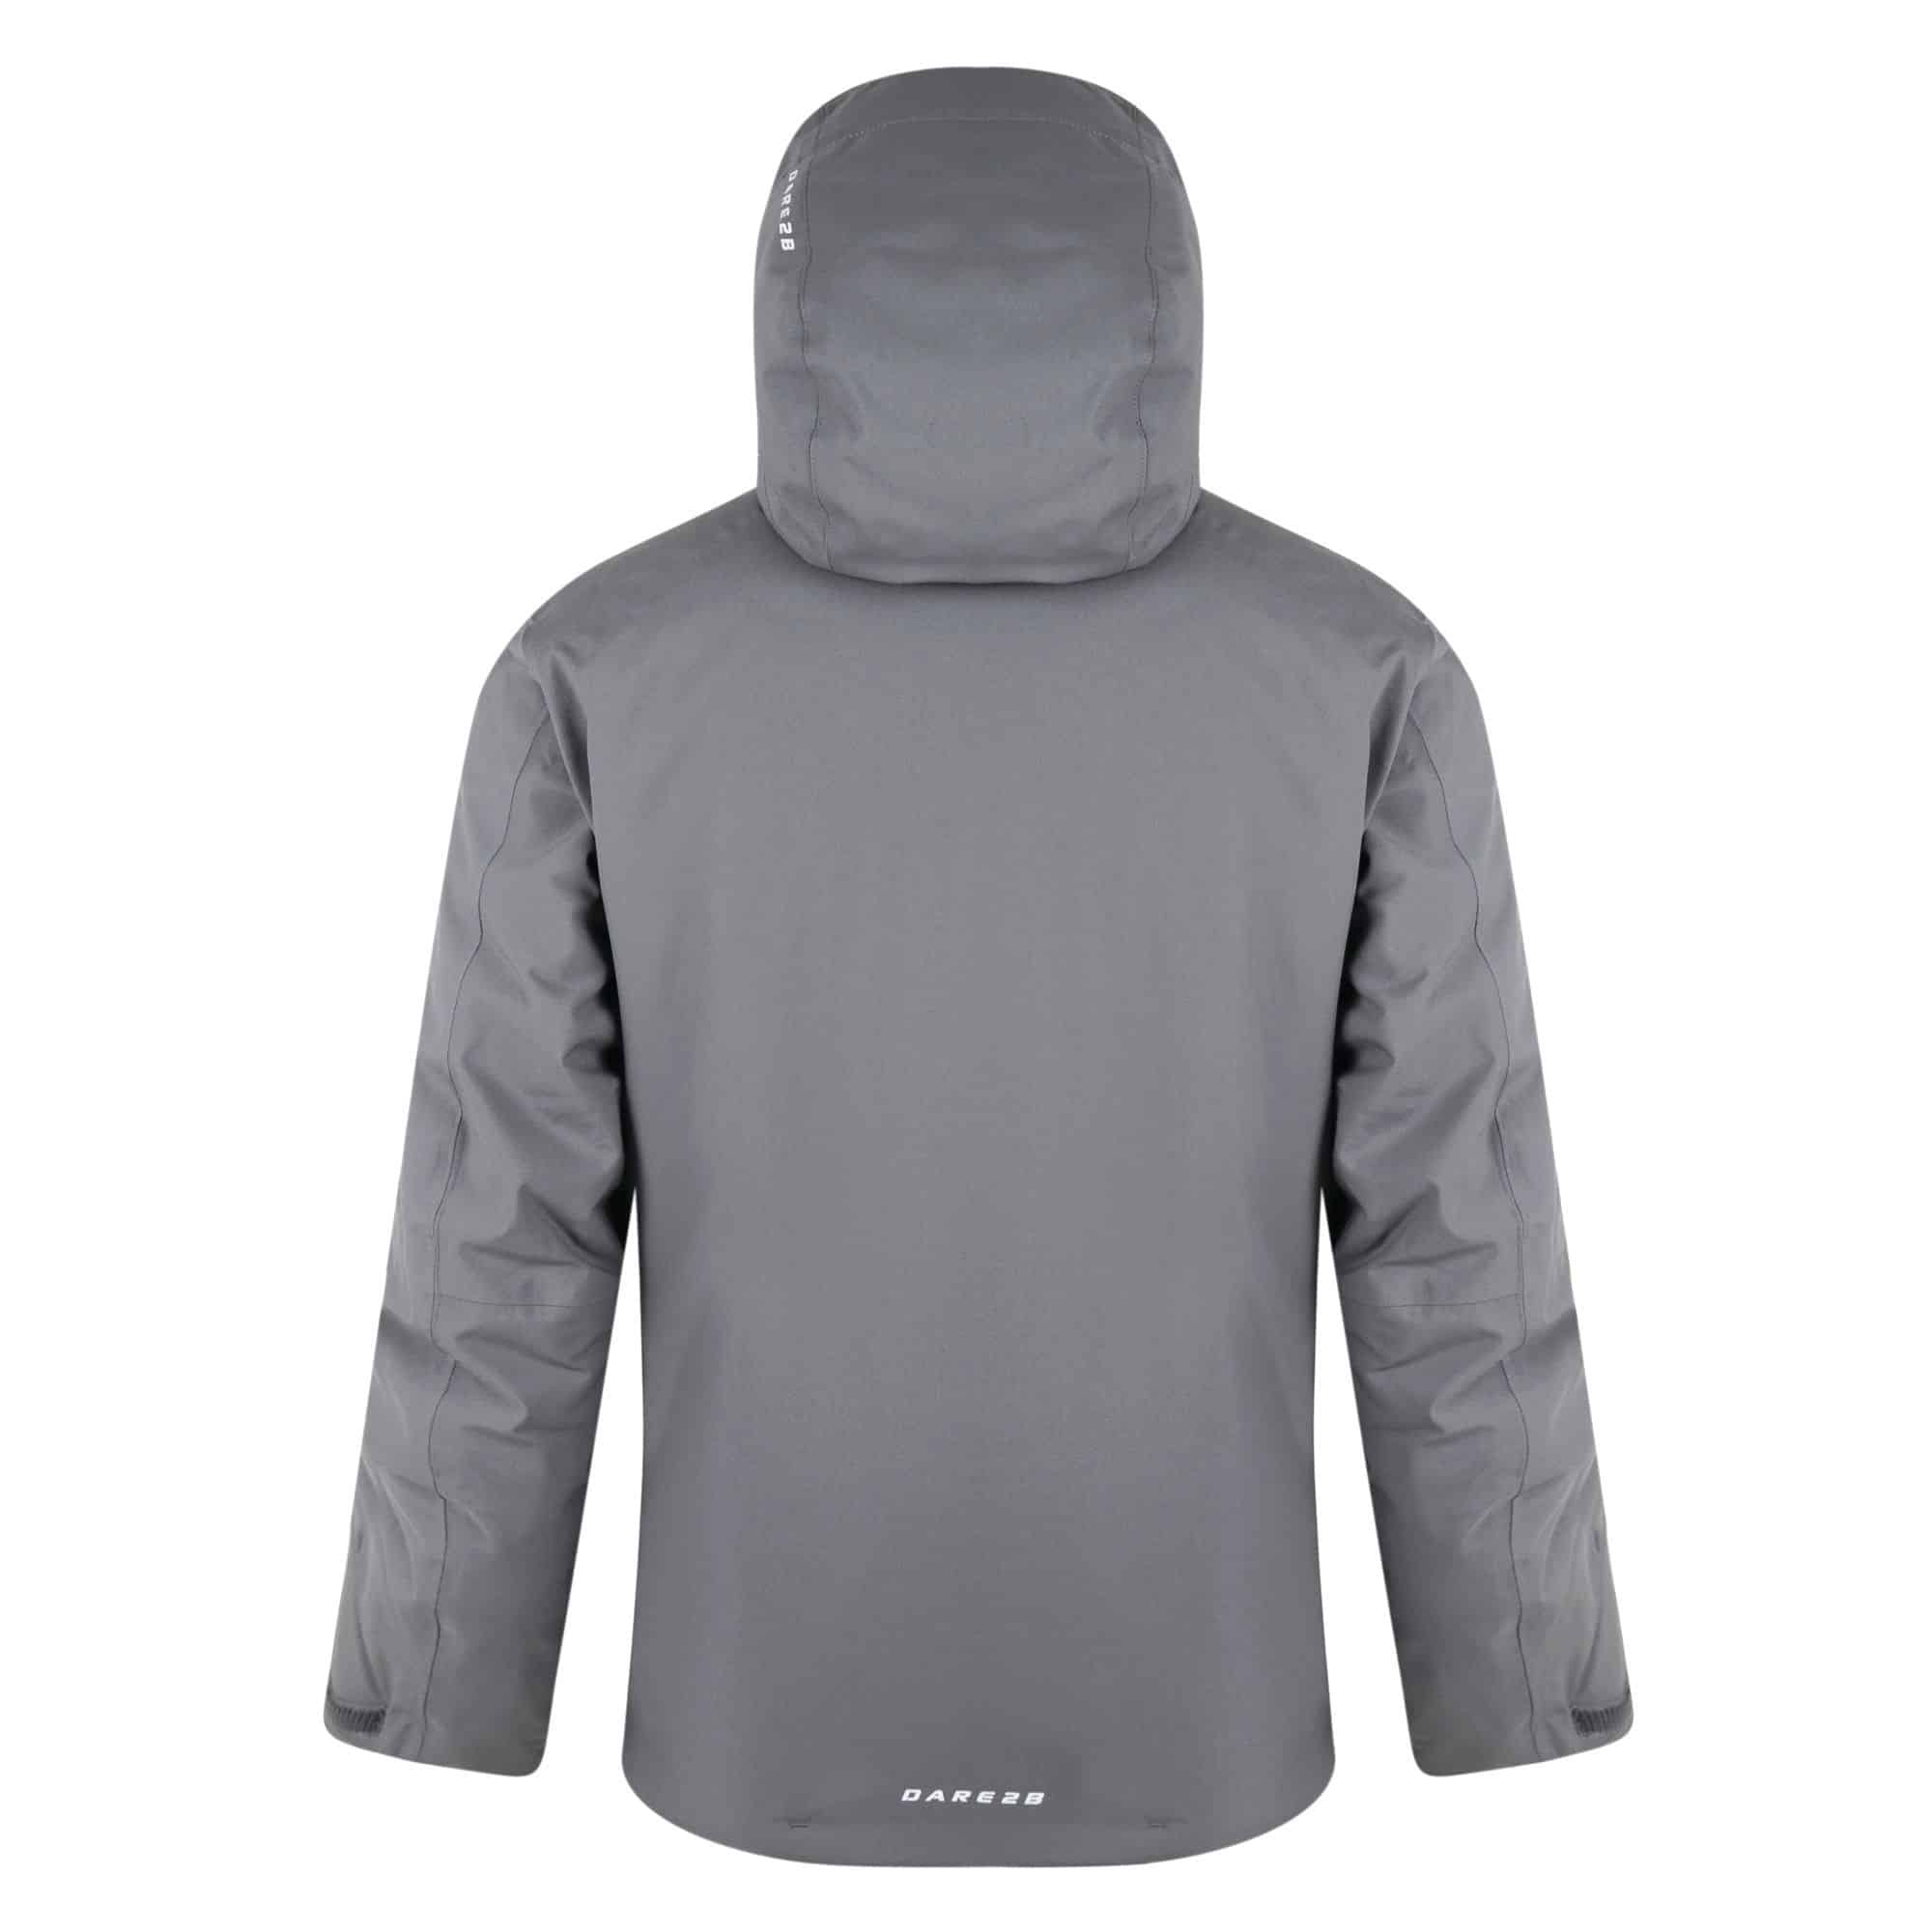 immensity II grey 3